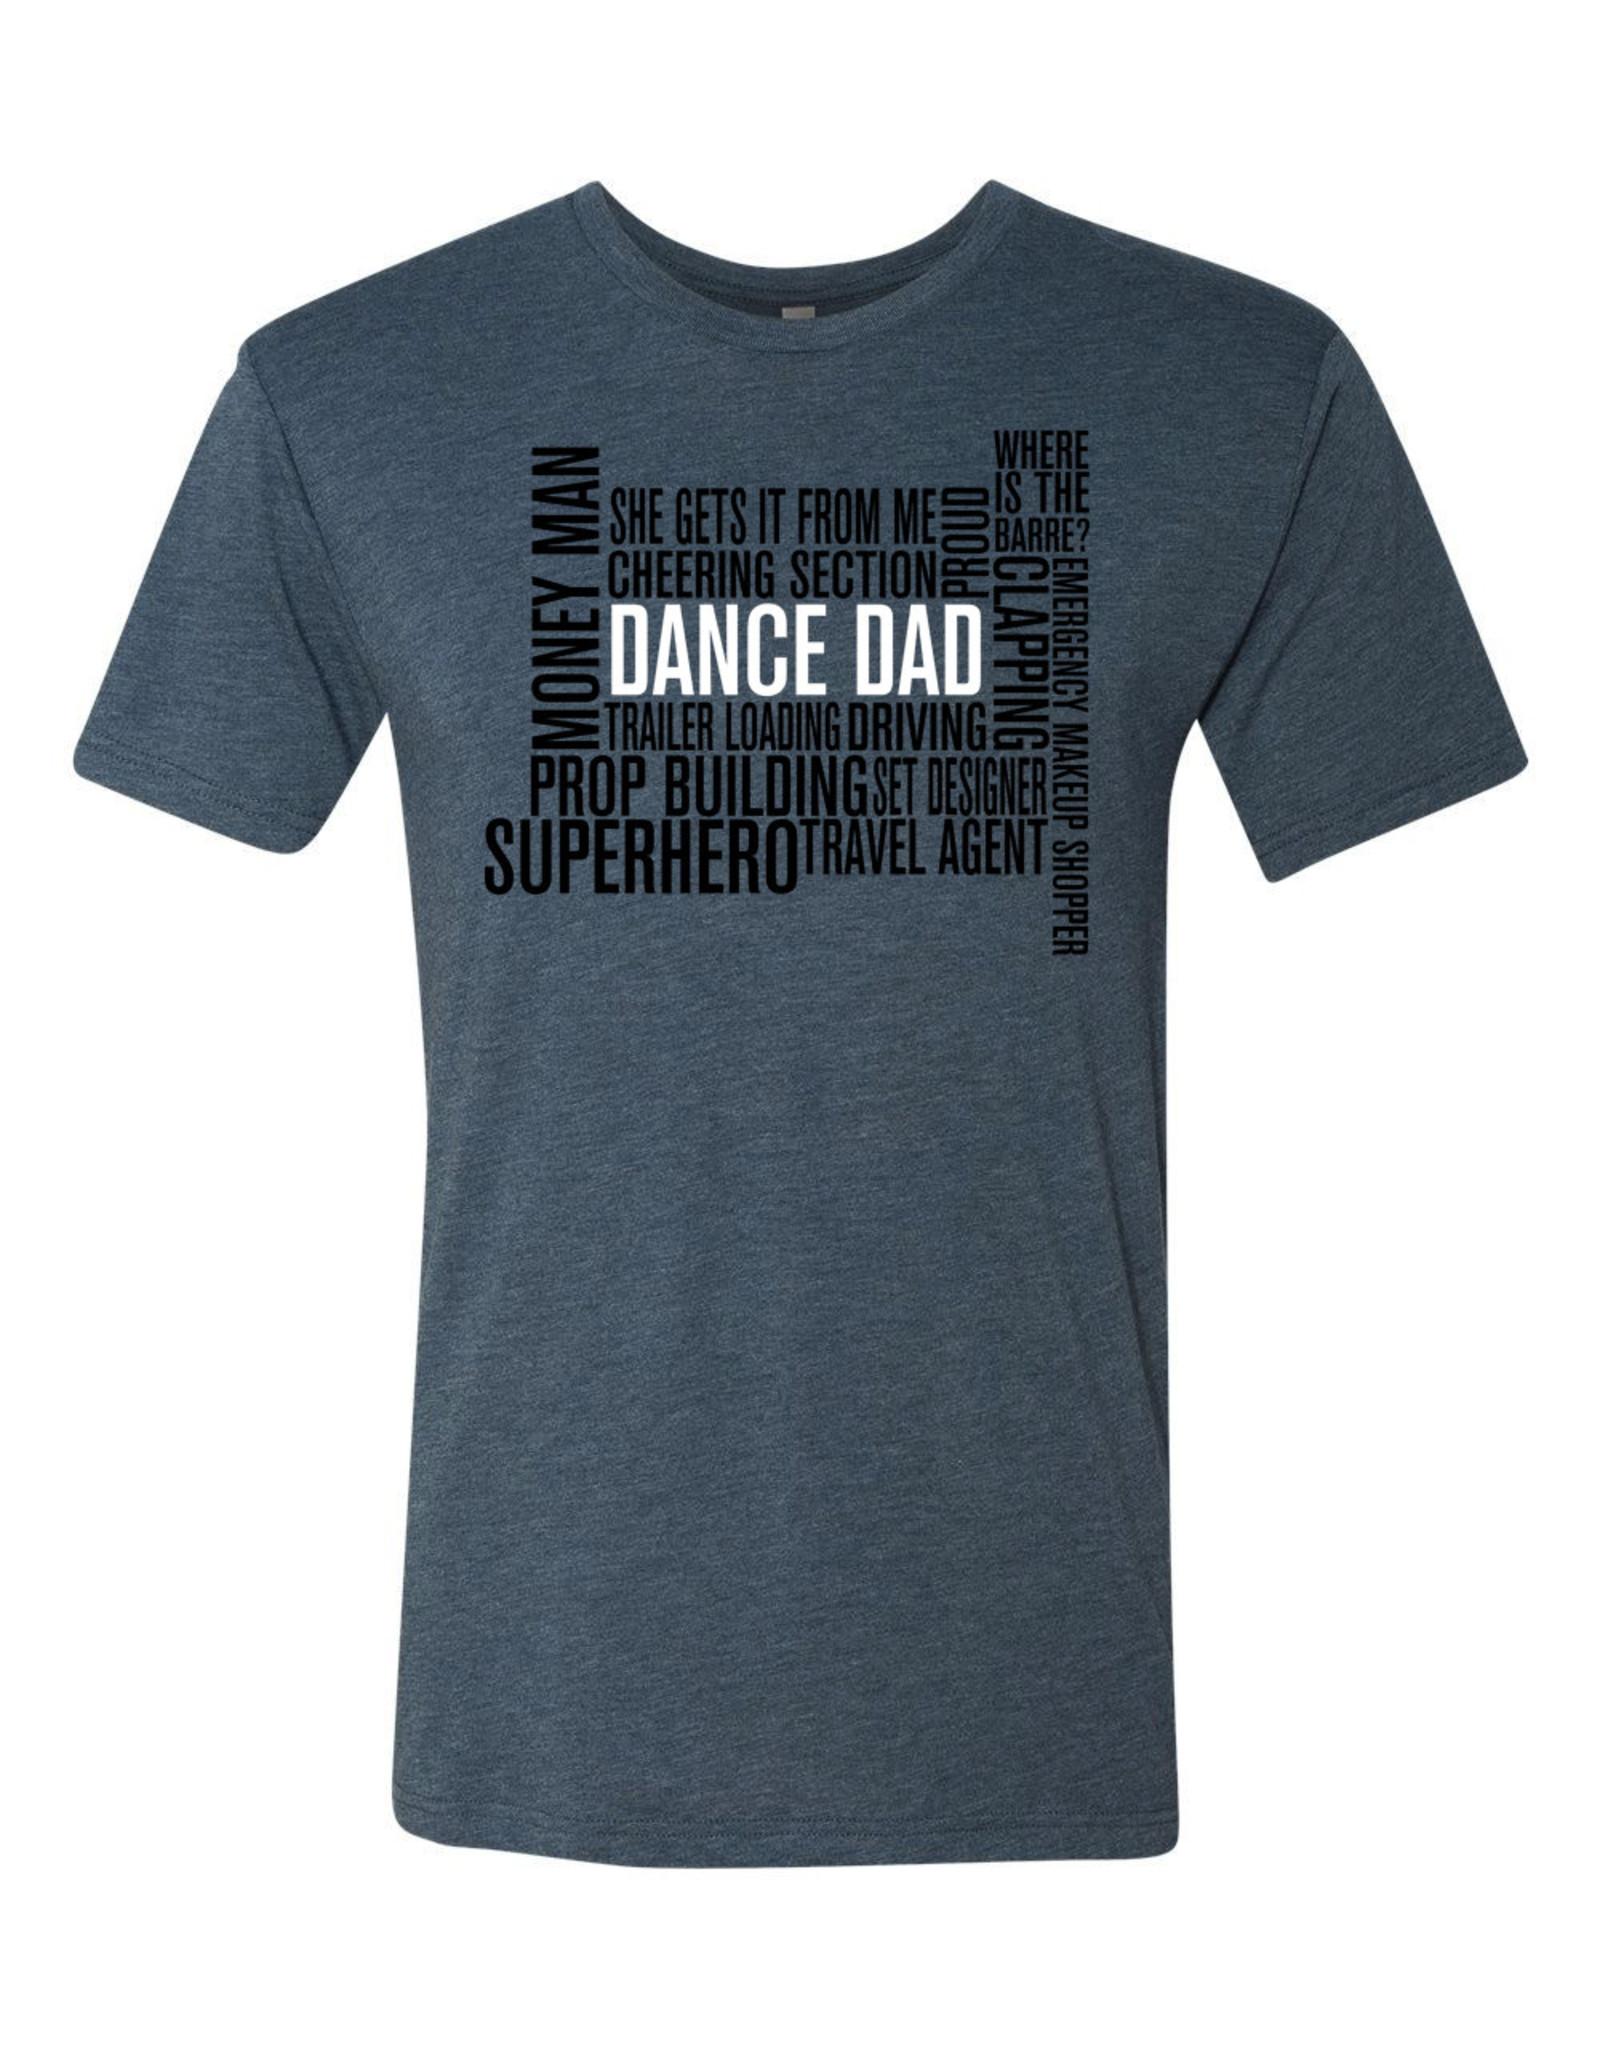 DANCE DAD 2020